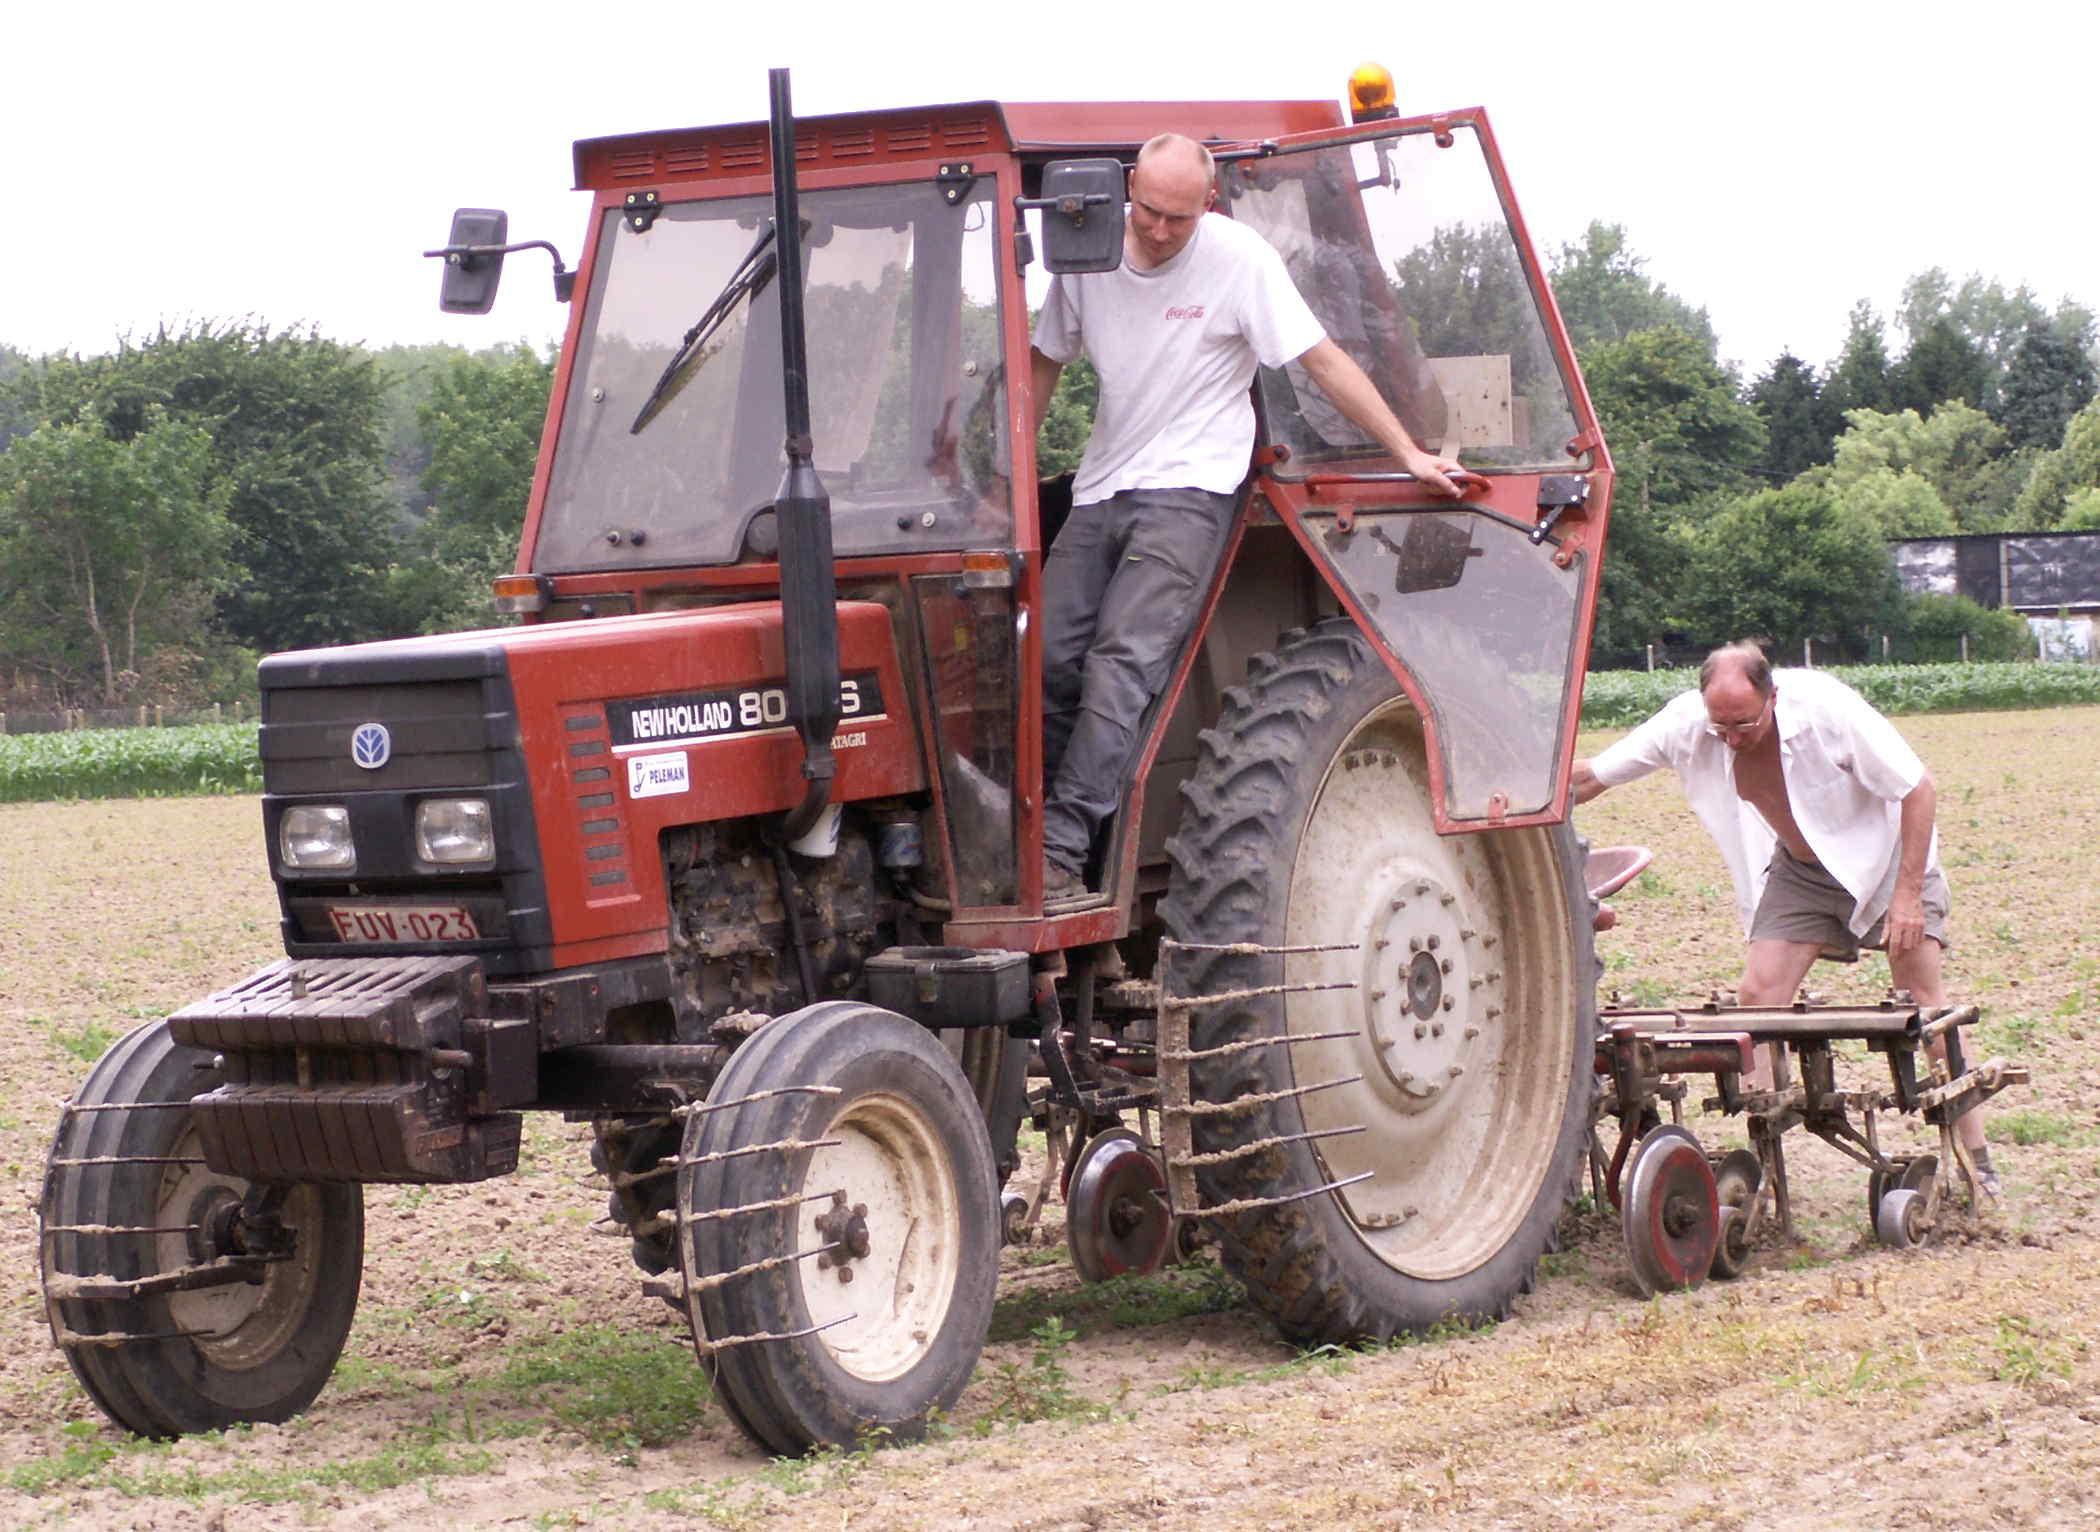 Tiller Tractor Images a Tractor-mounted Tiller